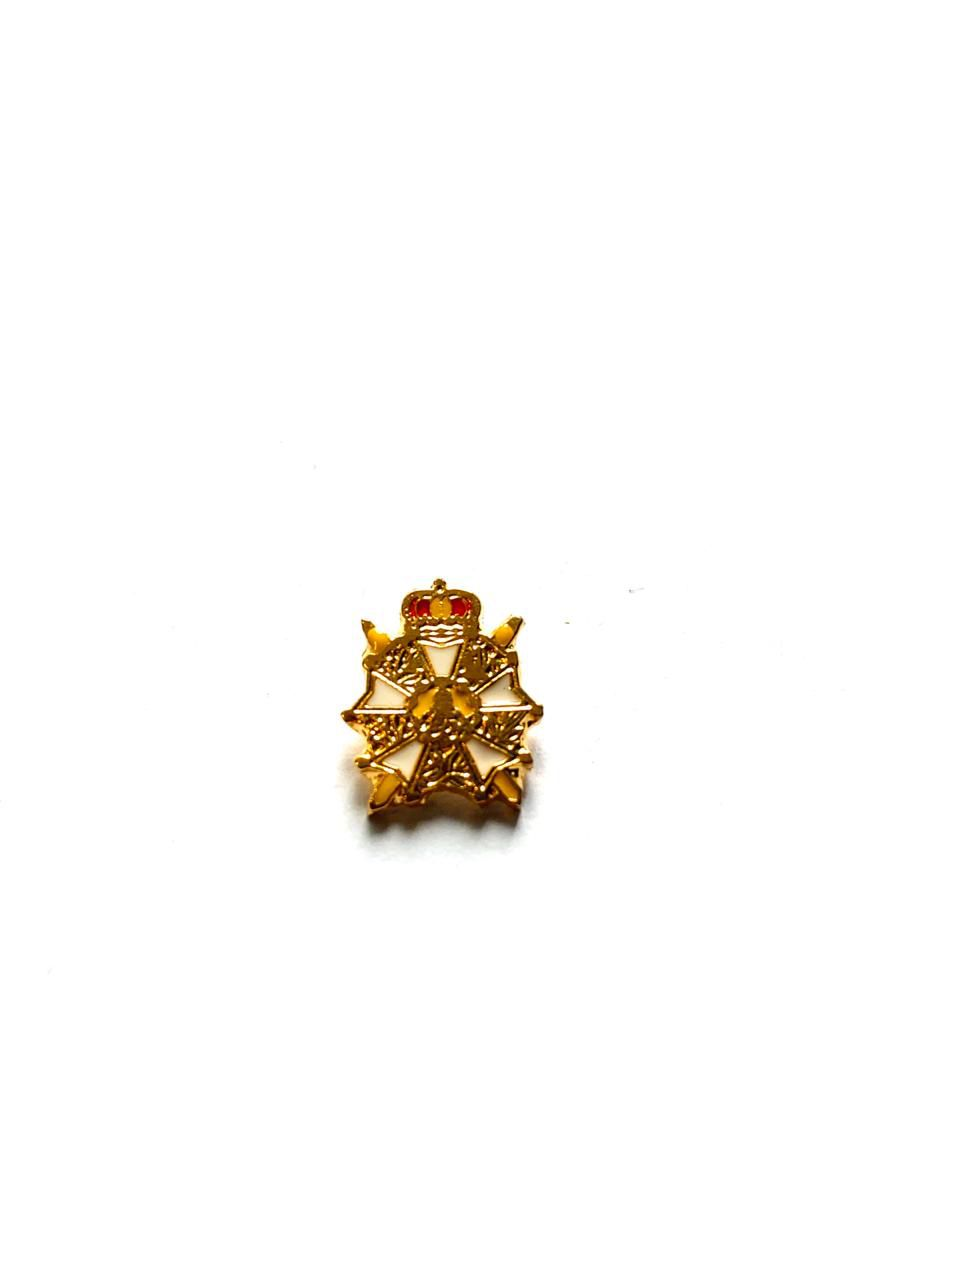 Pin Priorado Cavalaria DM